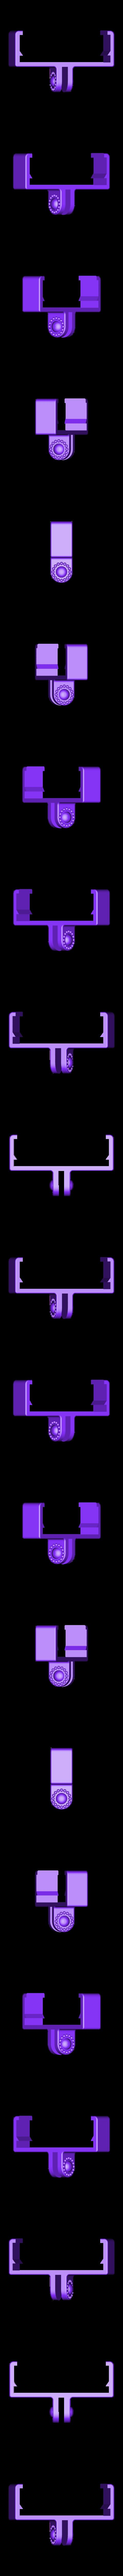 ultrasonic_2a V2.stl Download free STL file SMARS modular Robot • 3D printable design, Tuitxy